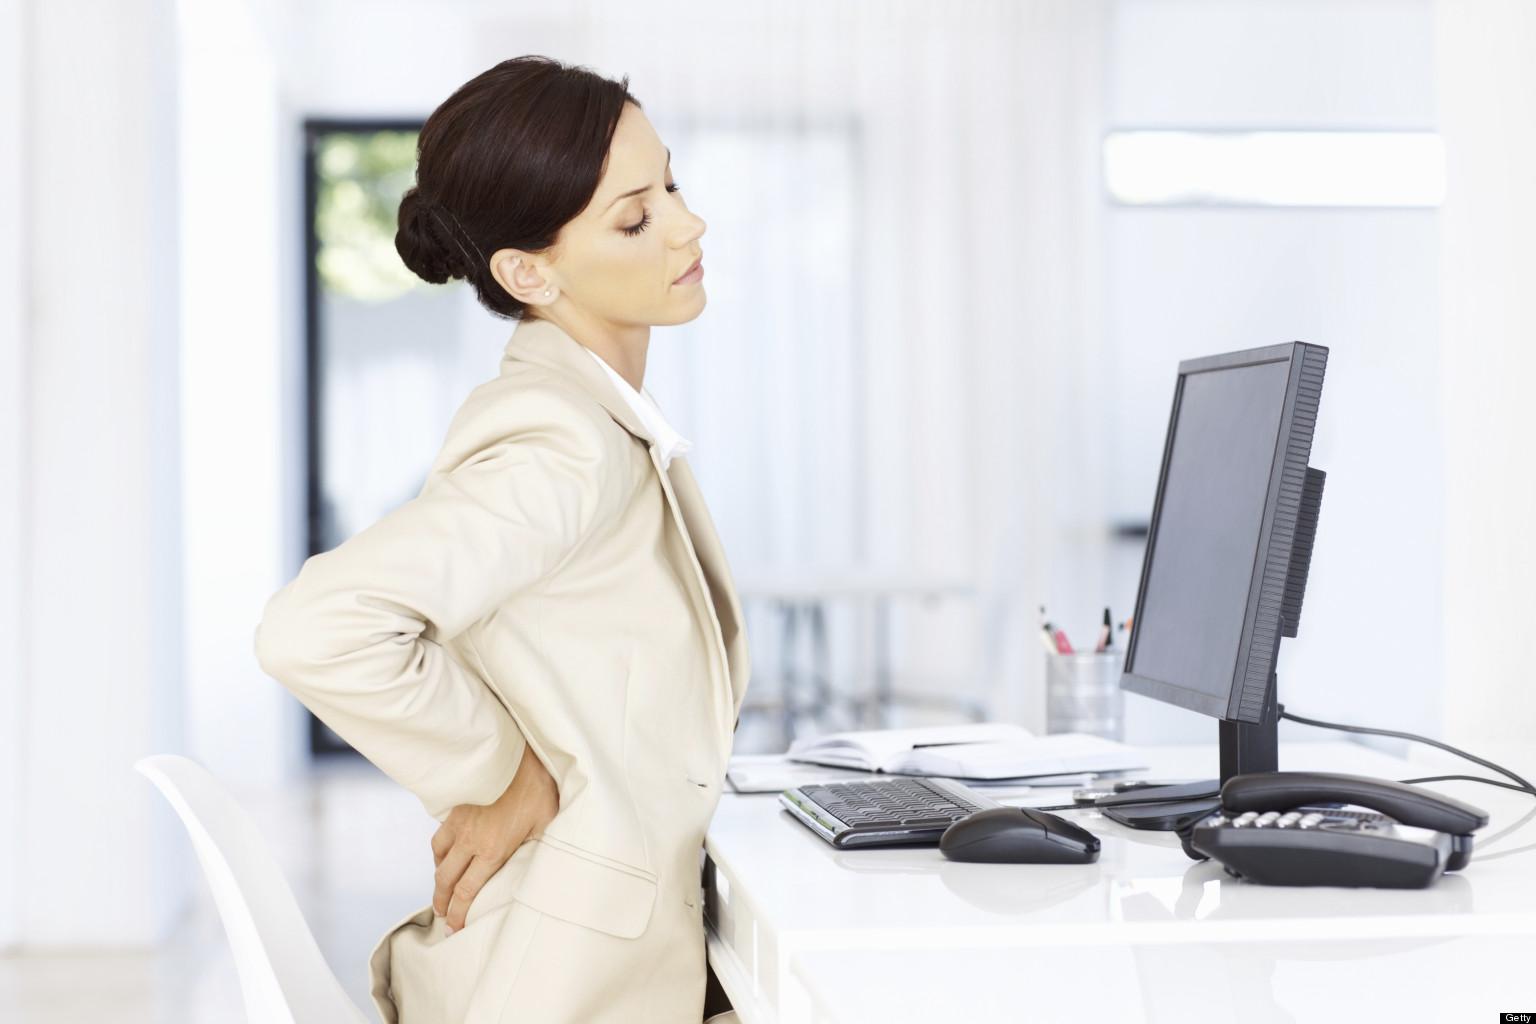 Chiropractor in Sydney CBD - Complete City Health